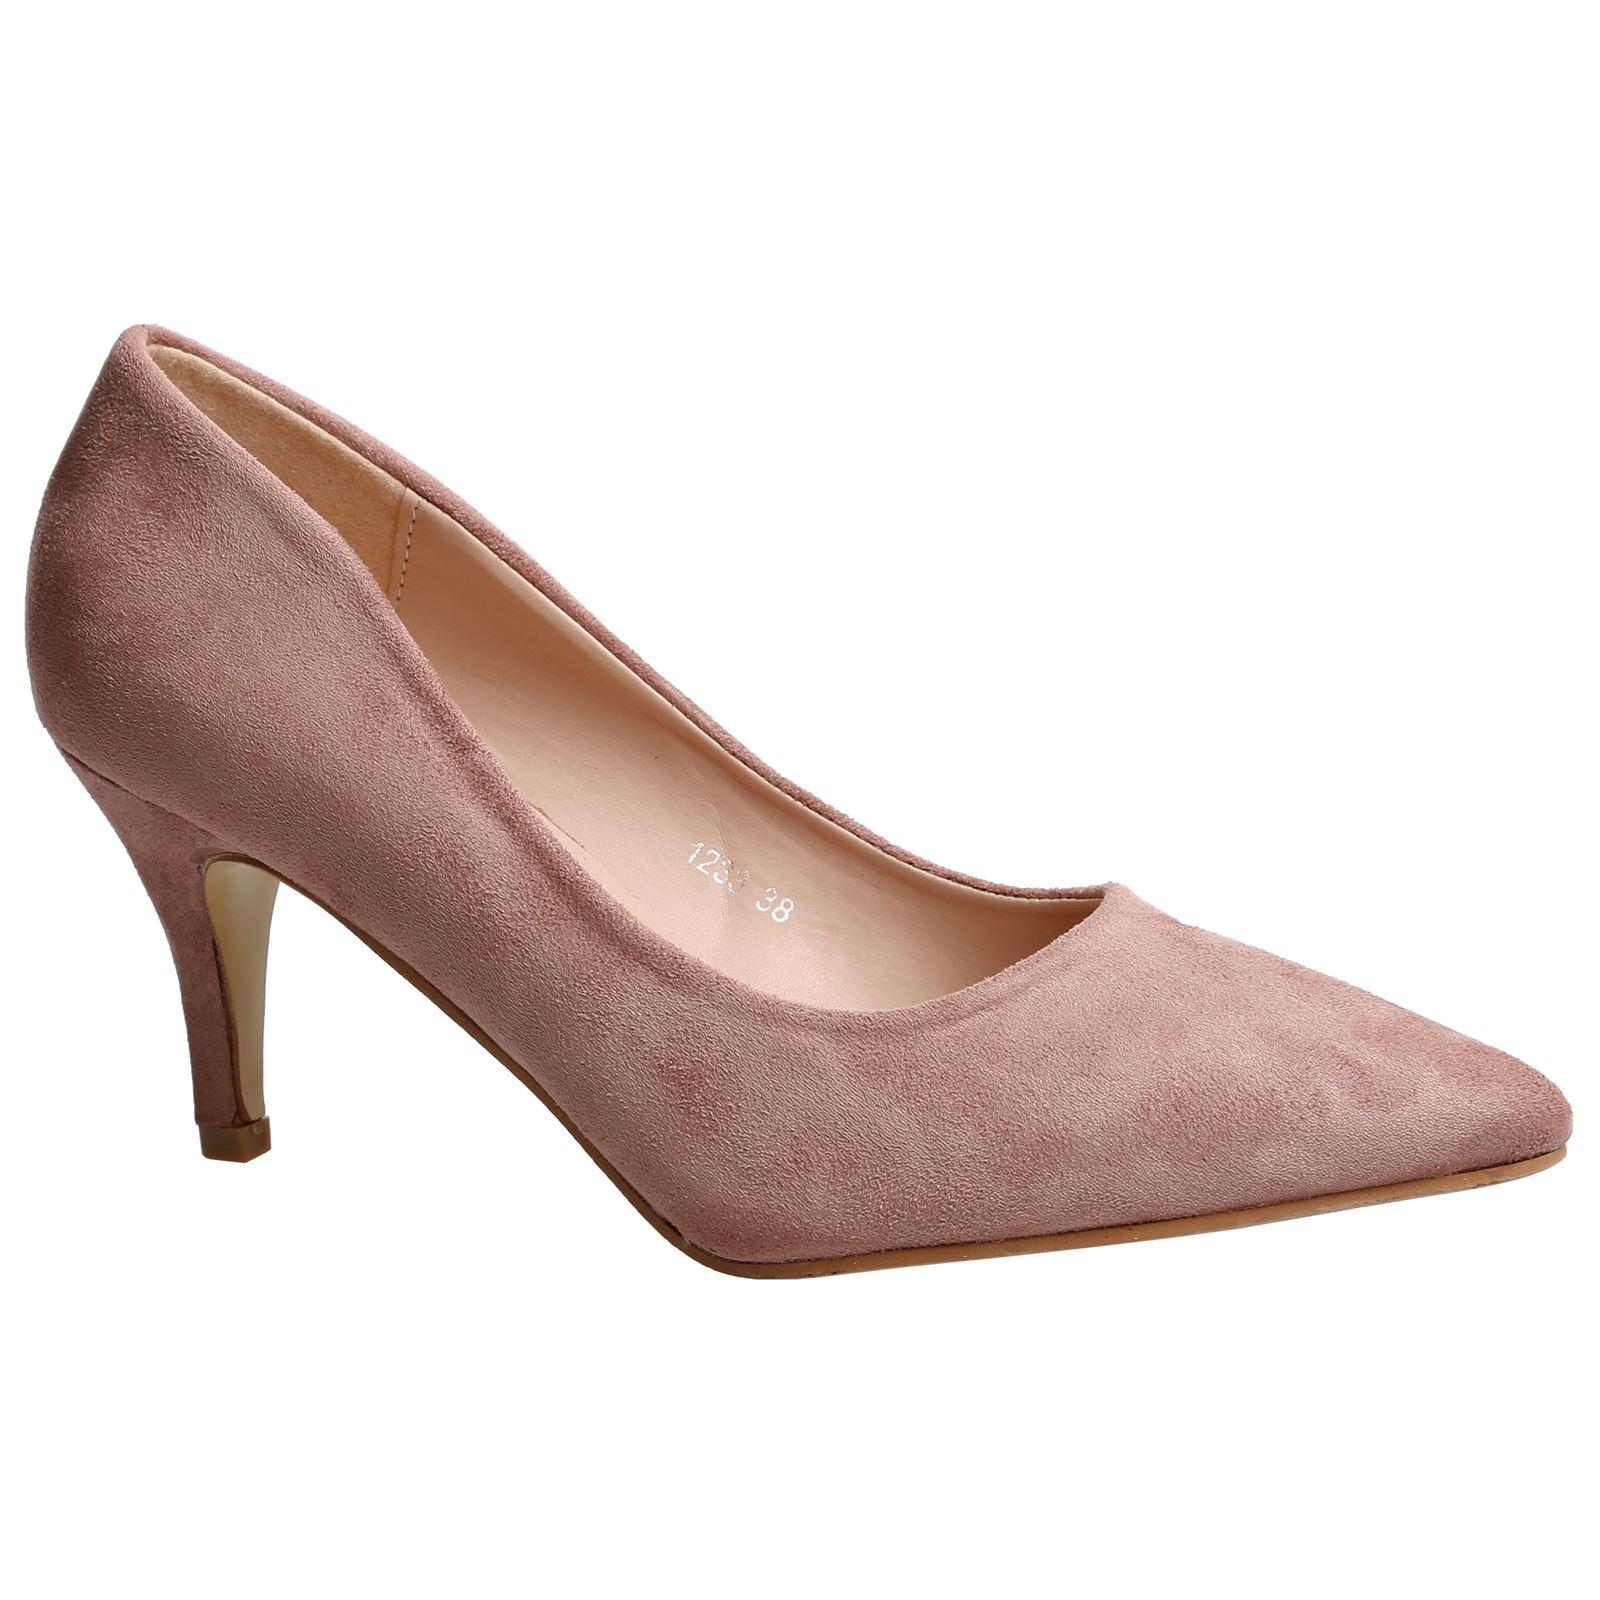 Miranda Womens Low Mid Kitten Heels Slip On Court Shoes